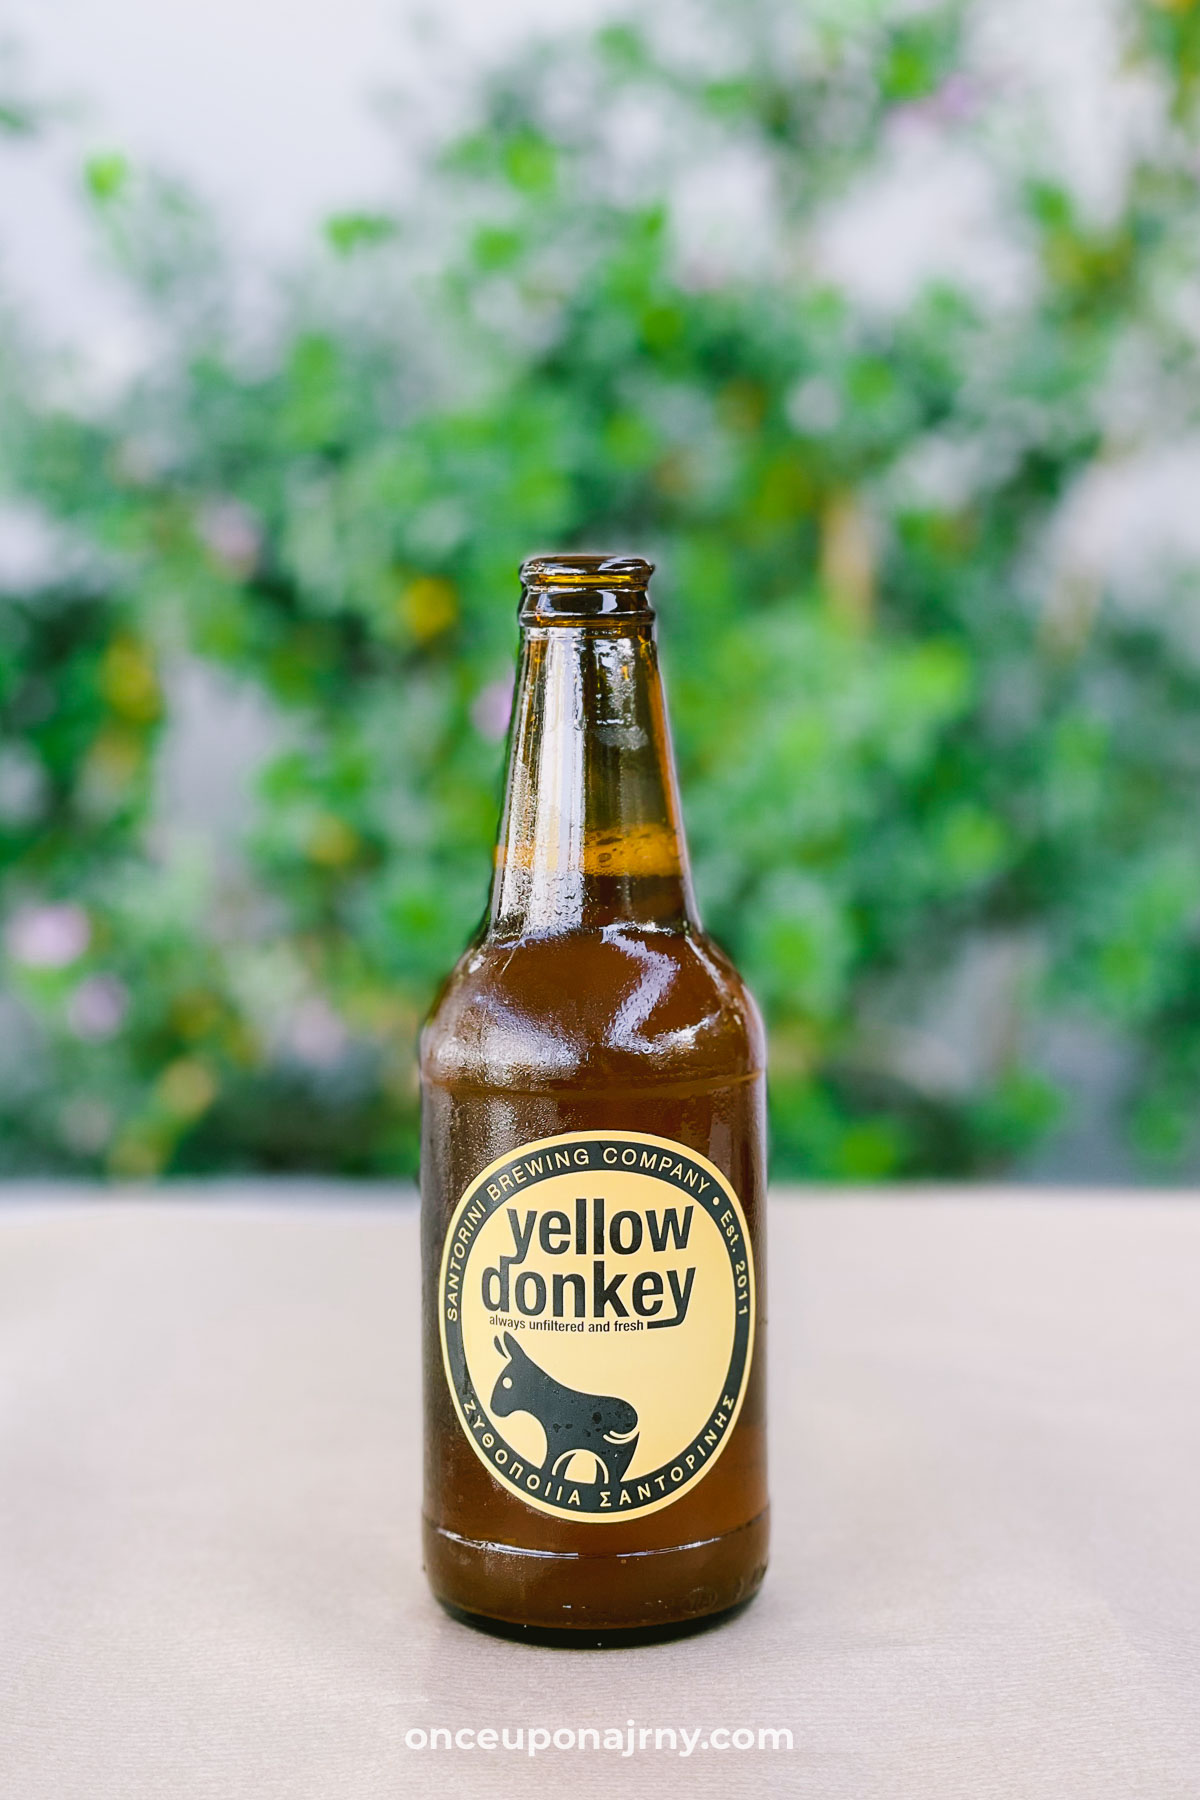 Santorini Donkey Beer